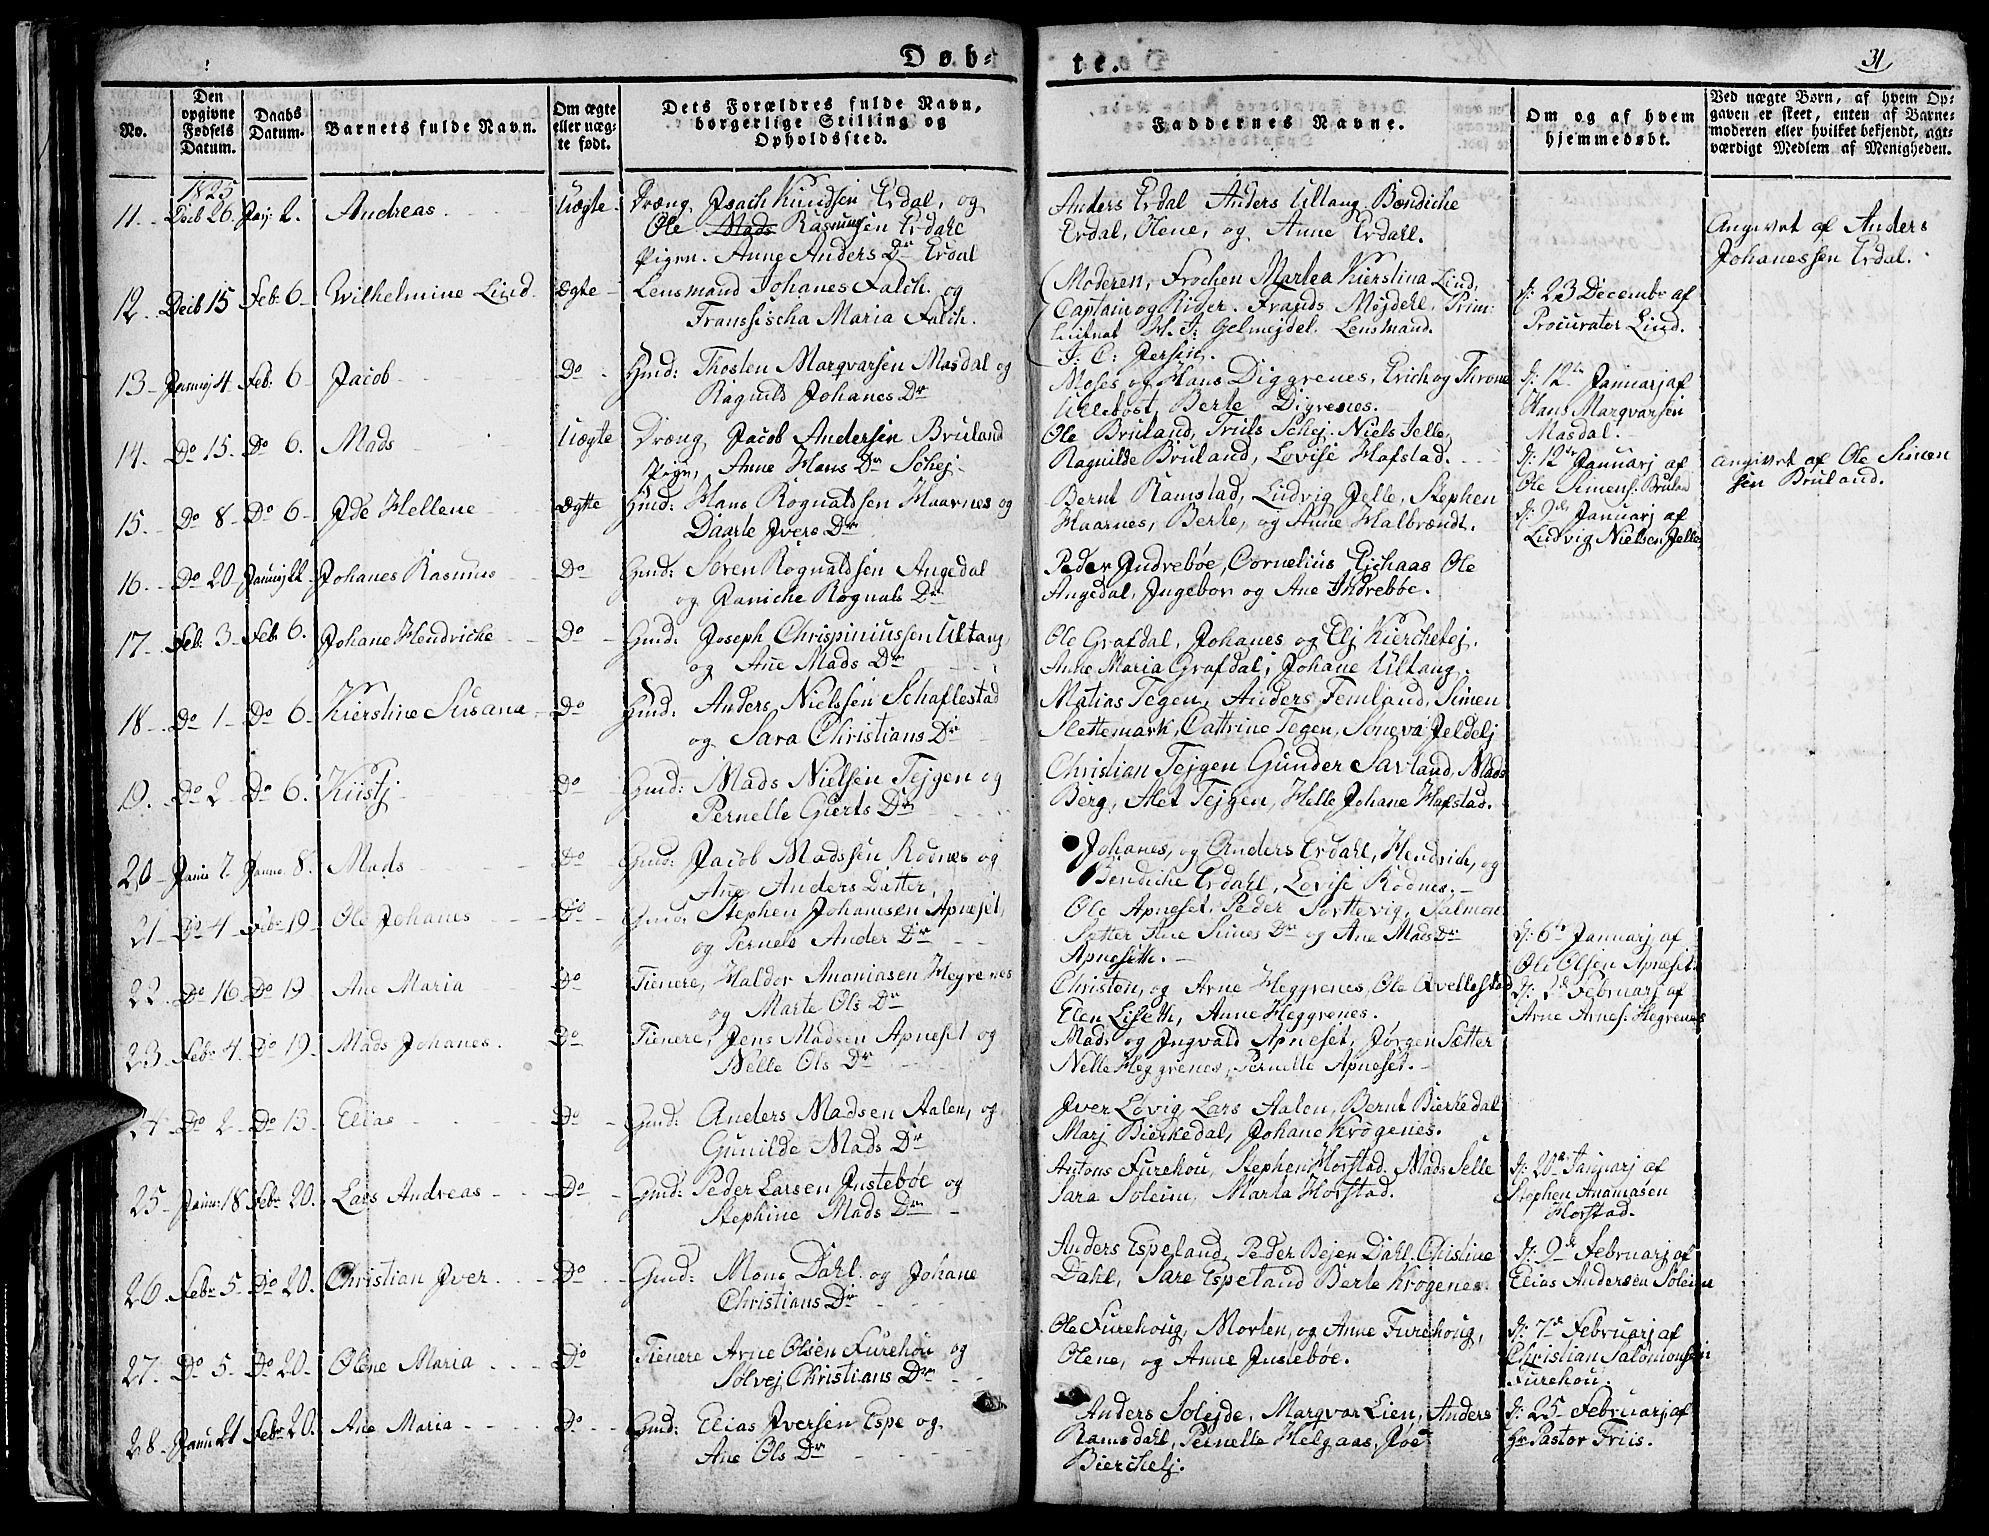 SAB, Førde sokneprestembete, H/Haa: Ministerialbok nr. A 6, 1821-1842, s. 31